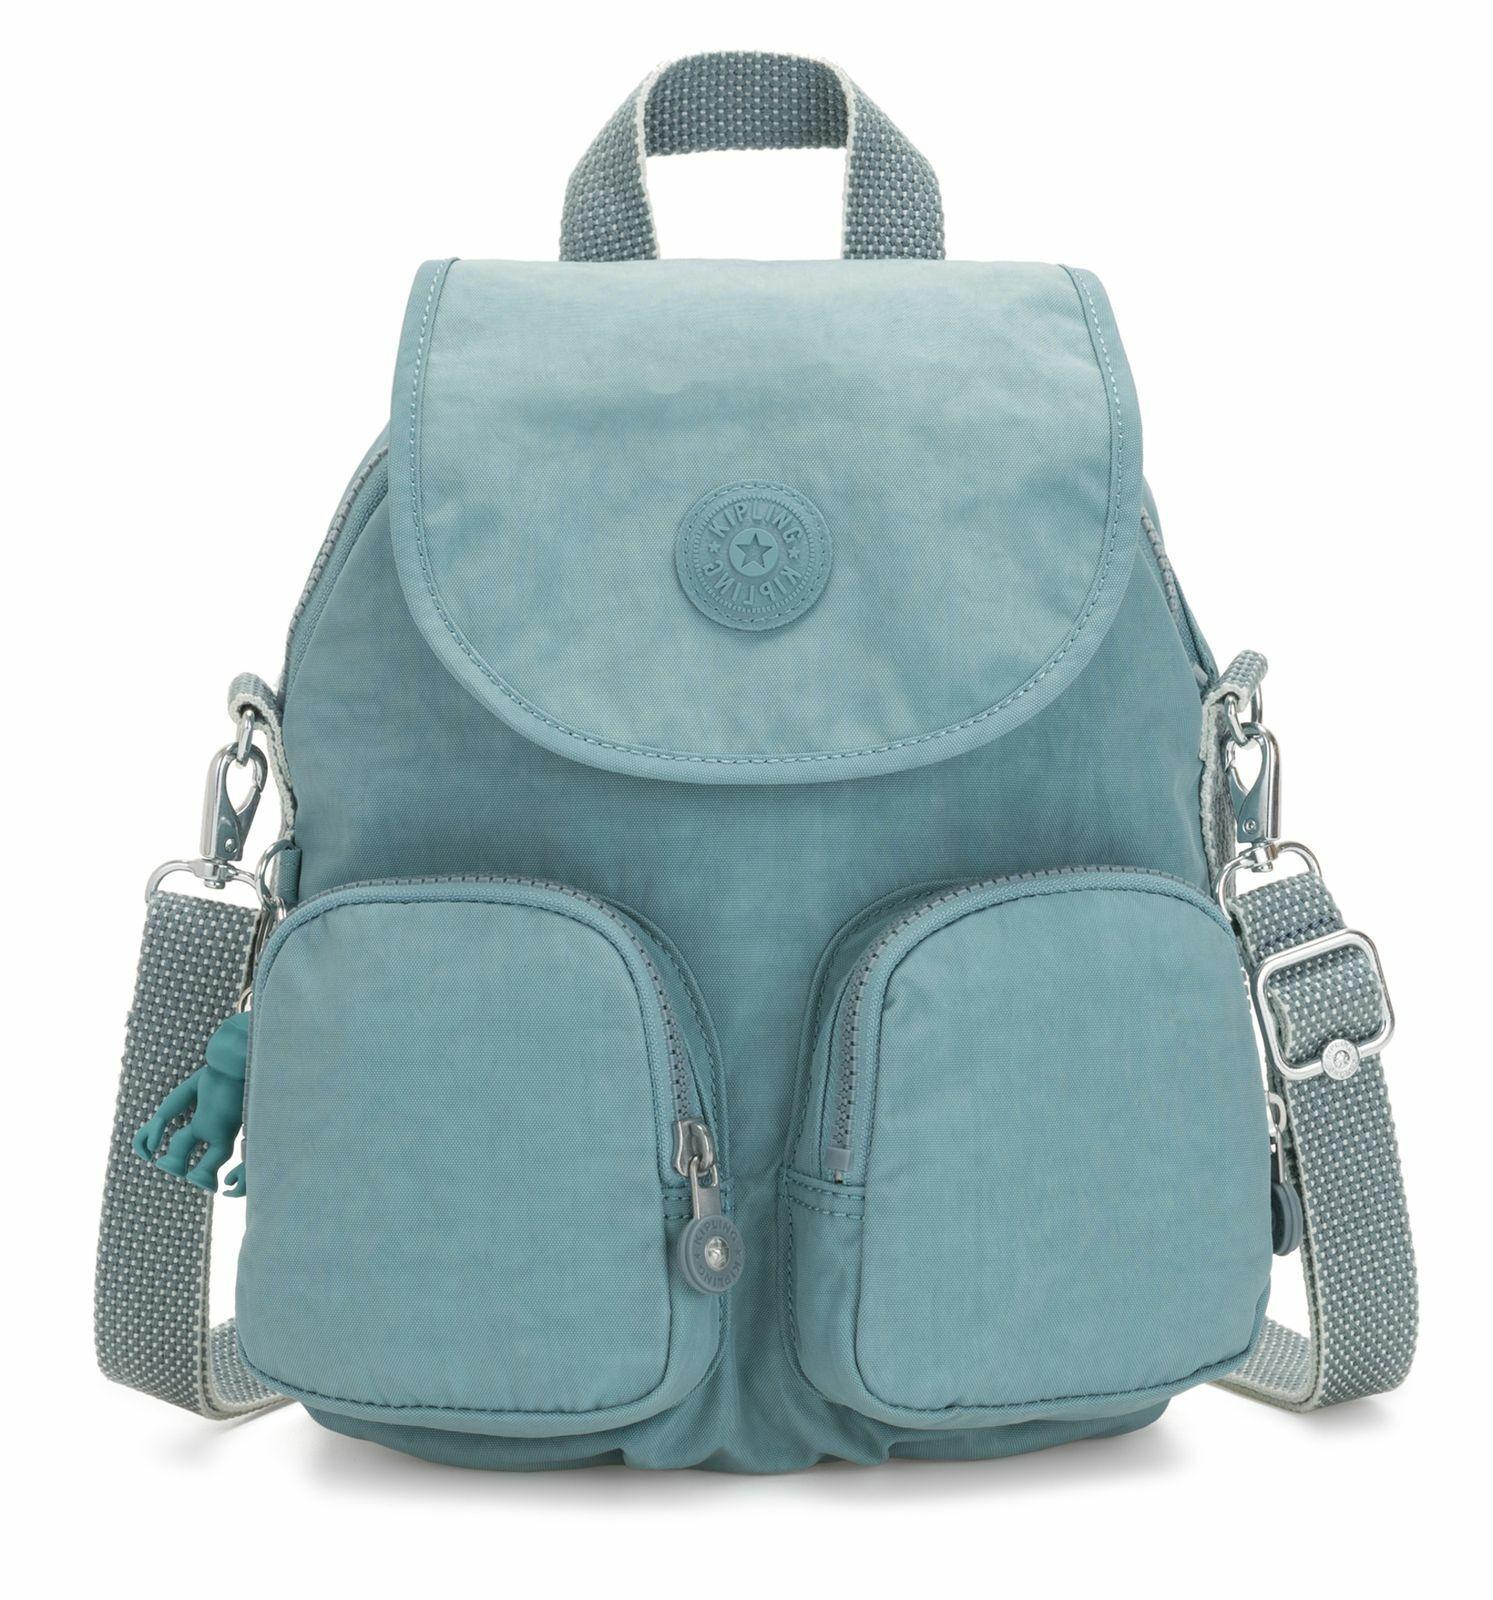 Kipling Firefly Up Smtutti Backpack Aqua Frost